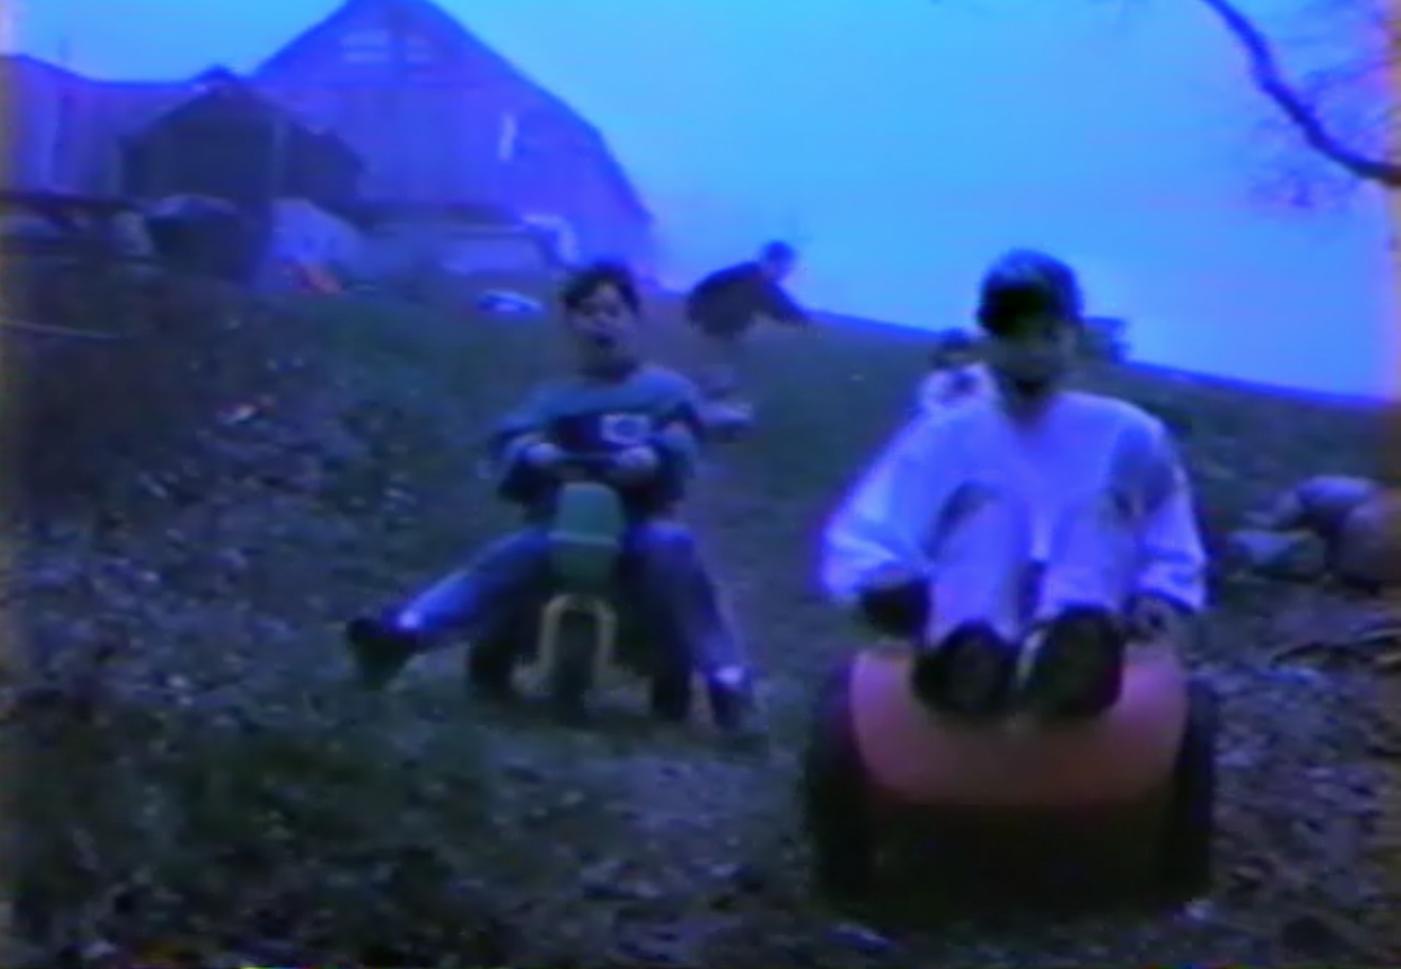 1993 -Kinnane Bros. borrow grandparents video camera